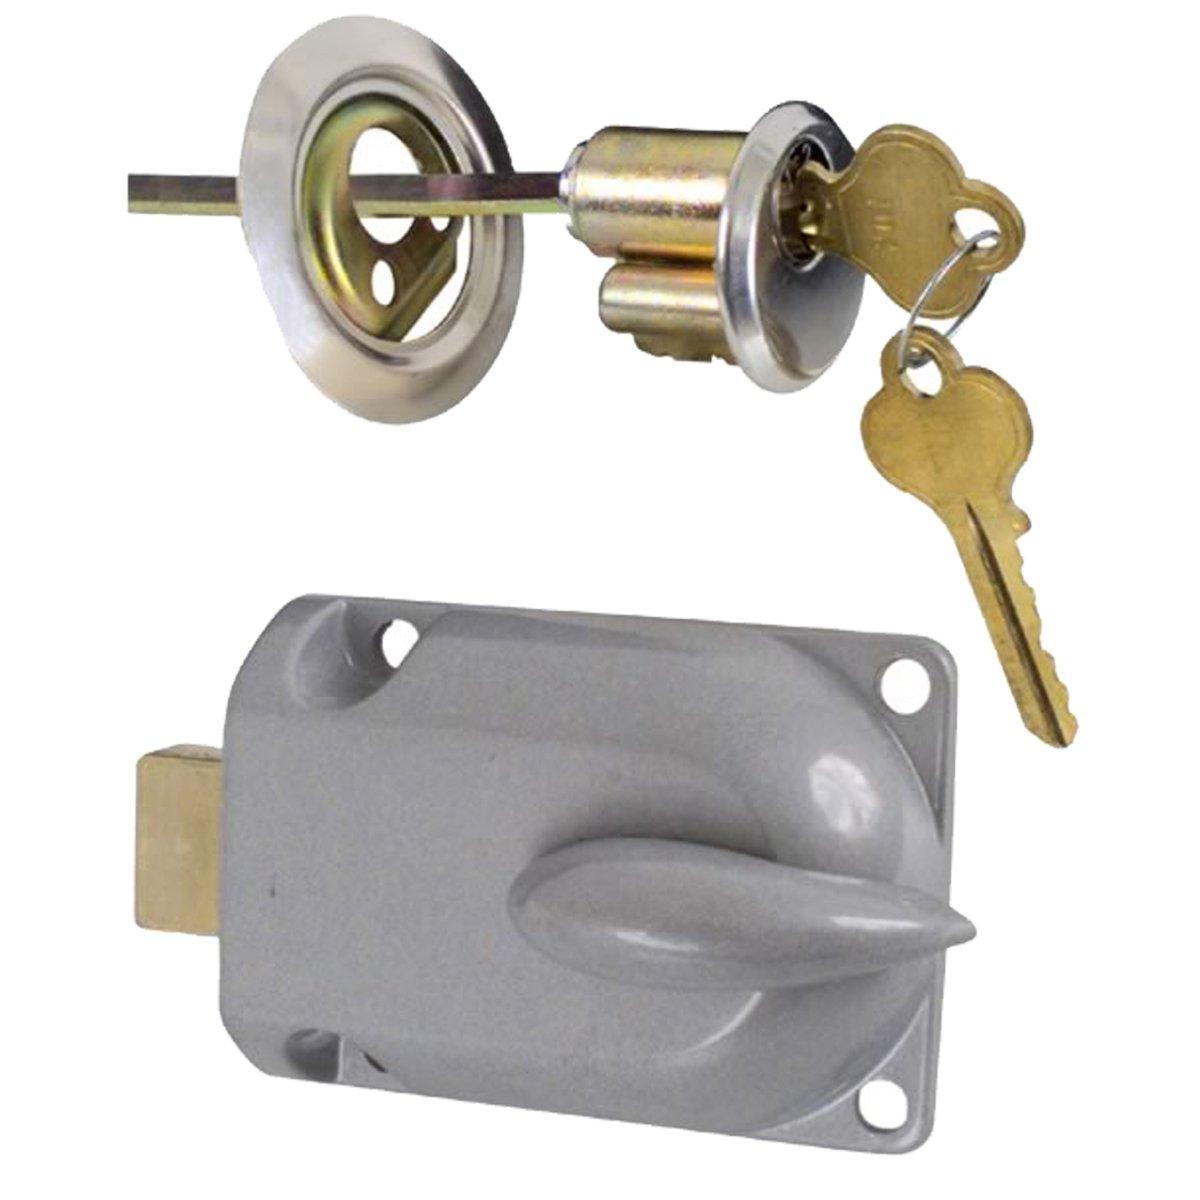 Ideal Security SK7160 Deadbolt Lock for Garage Doors - Cabinet And ...